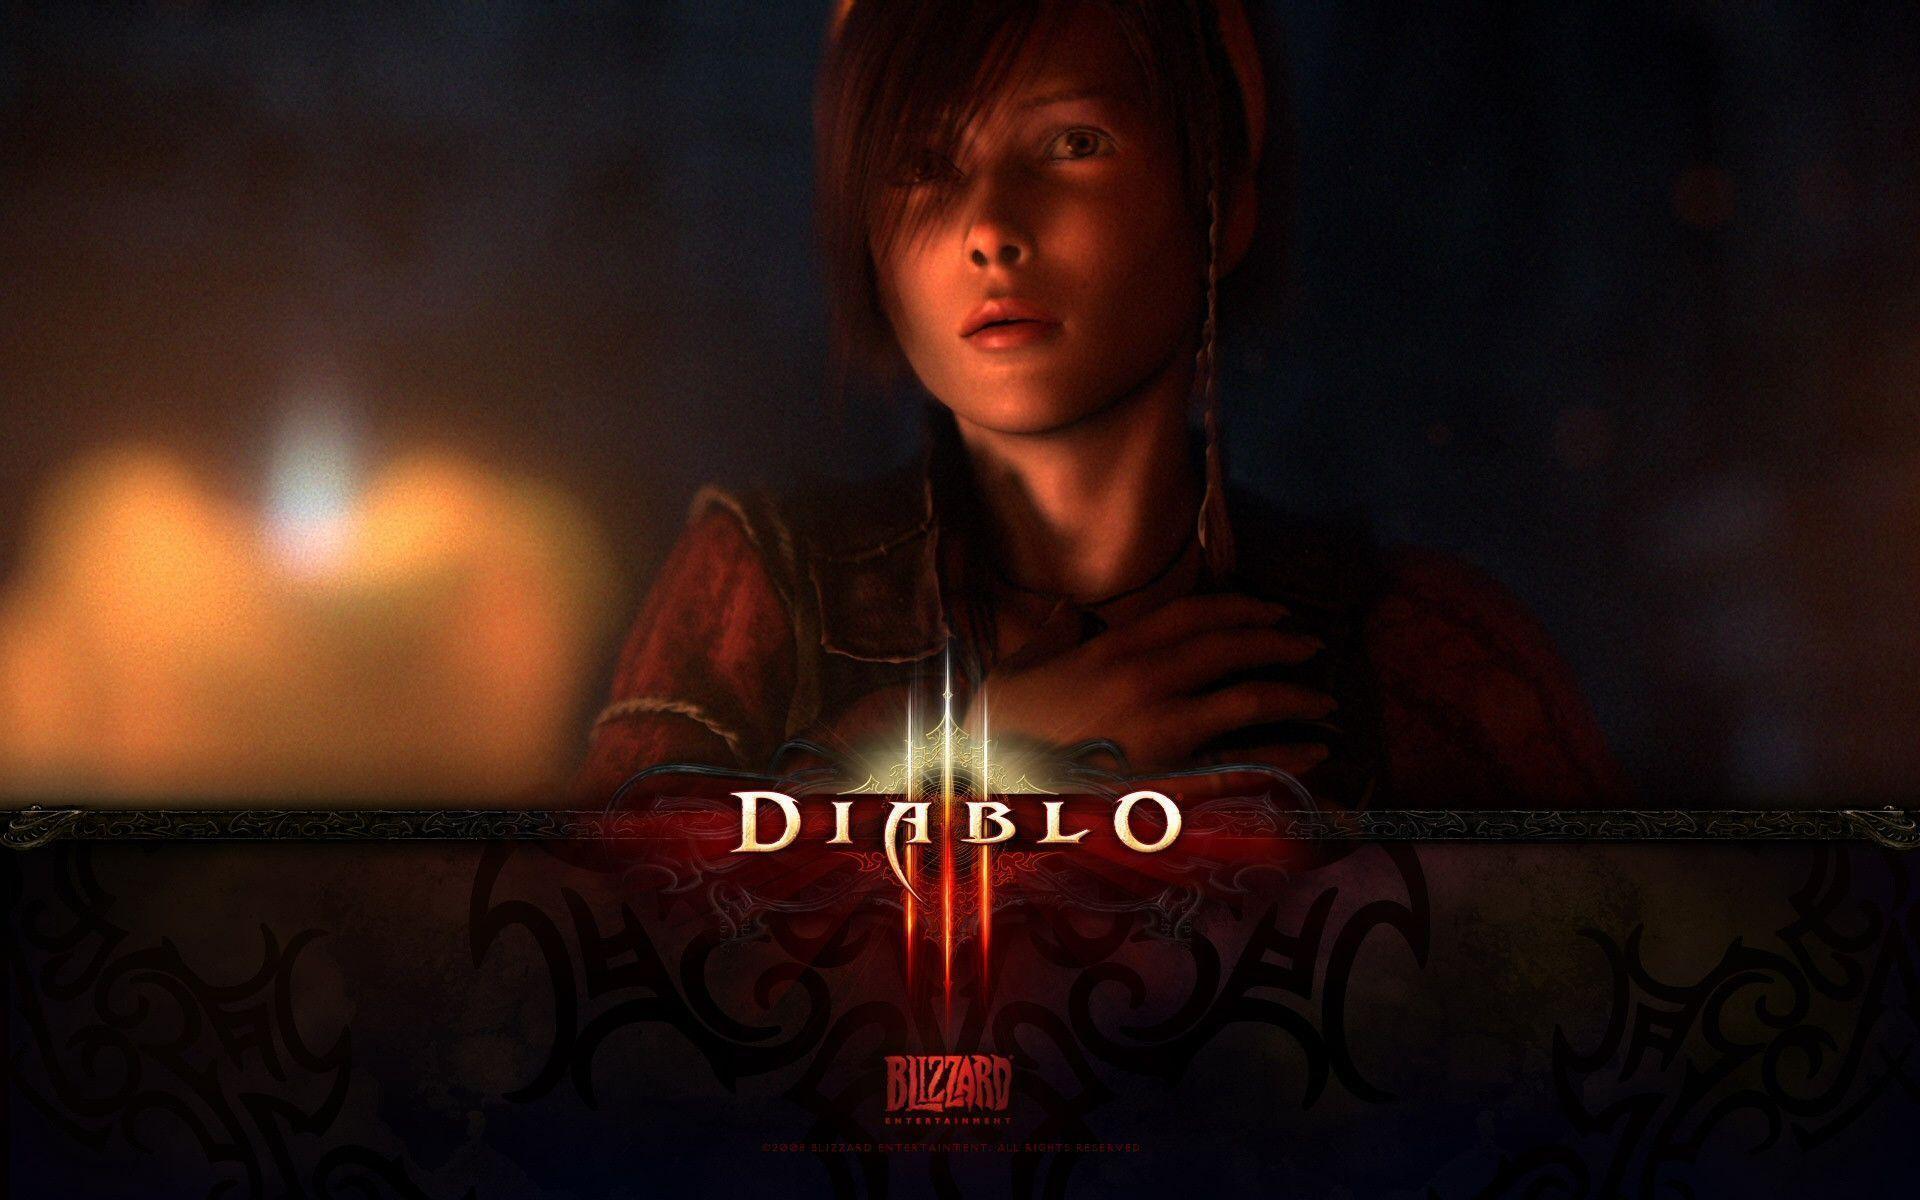 Diablo 3 Wallpaper Hd wallpaper - 77699